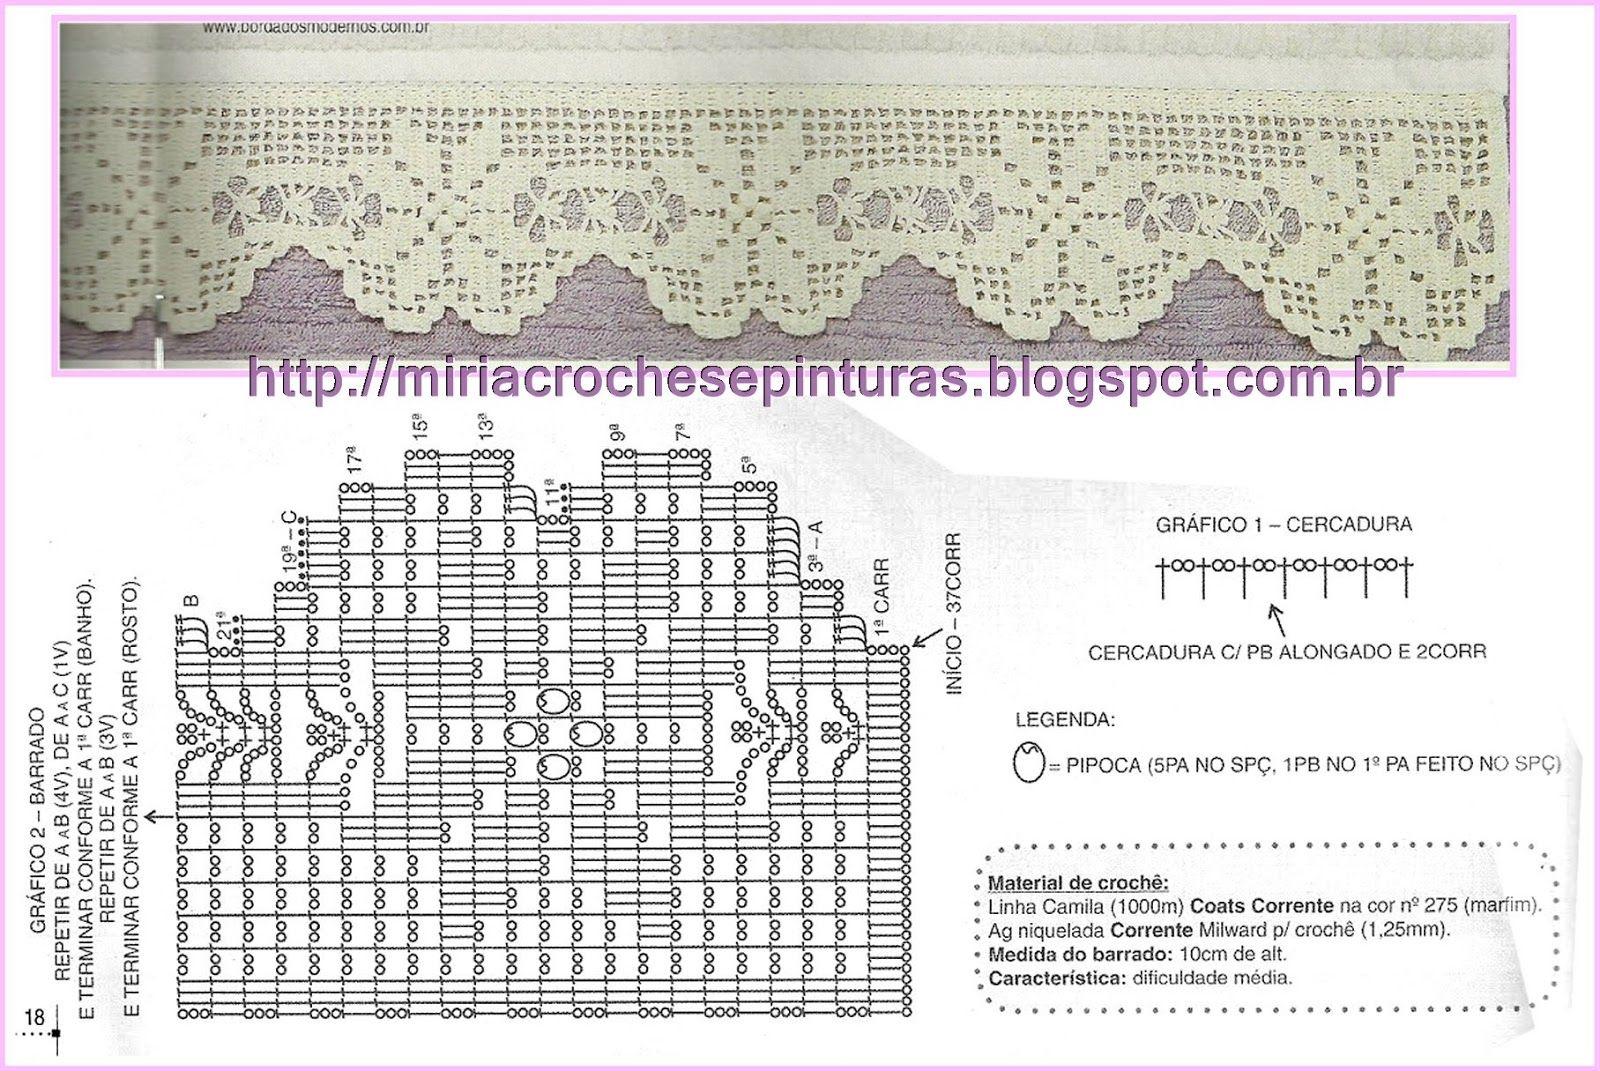 Crochet Edging Border Trim | ✂ Crochet - Edgings with Charts ...